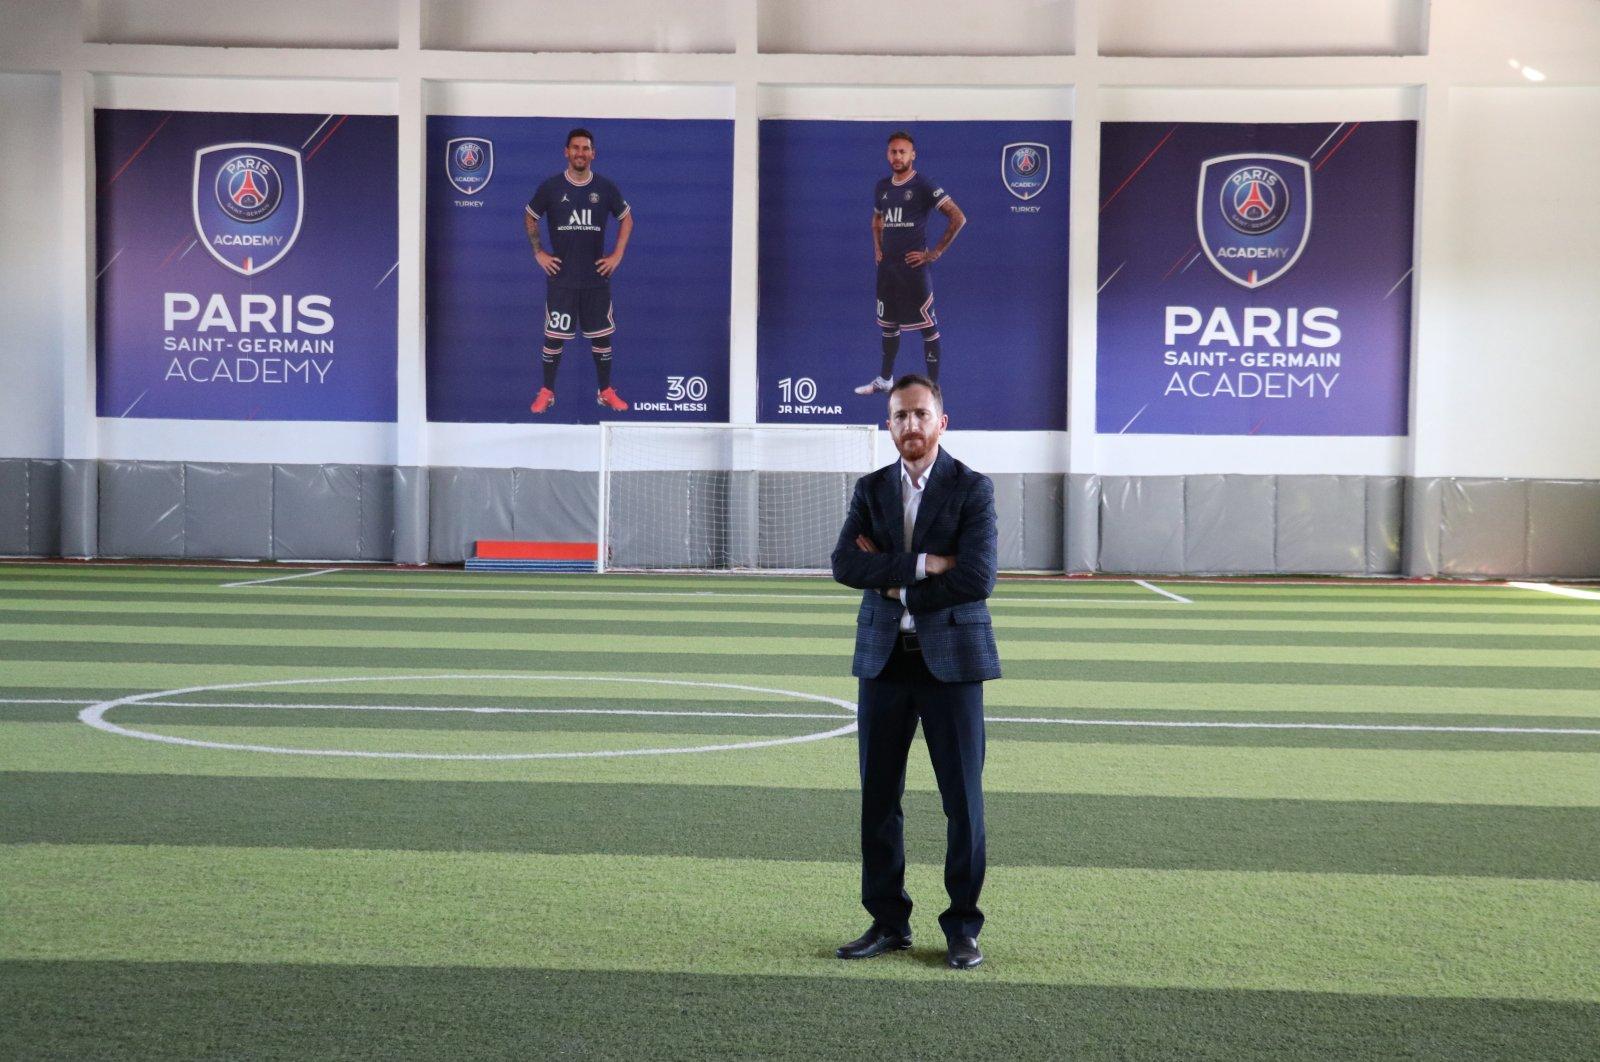 Ahmet Dal, the head of Erzurum Metropolitan Municipality's sports branch, at the newly opened Paris Saint-Germain (PSG) football academy, Erzurum, eastern Turkey, Sept. 15, 2021. (AA Photo)